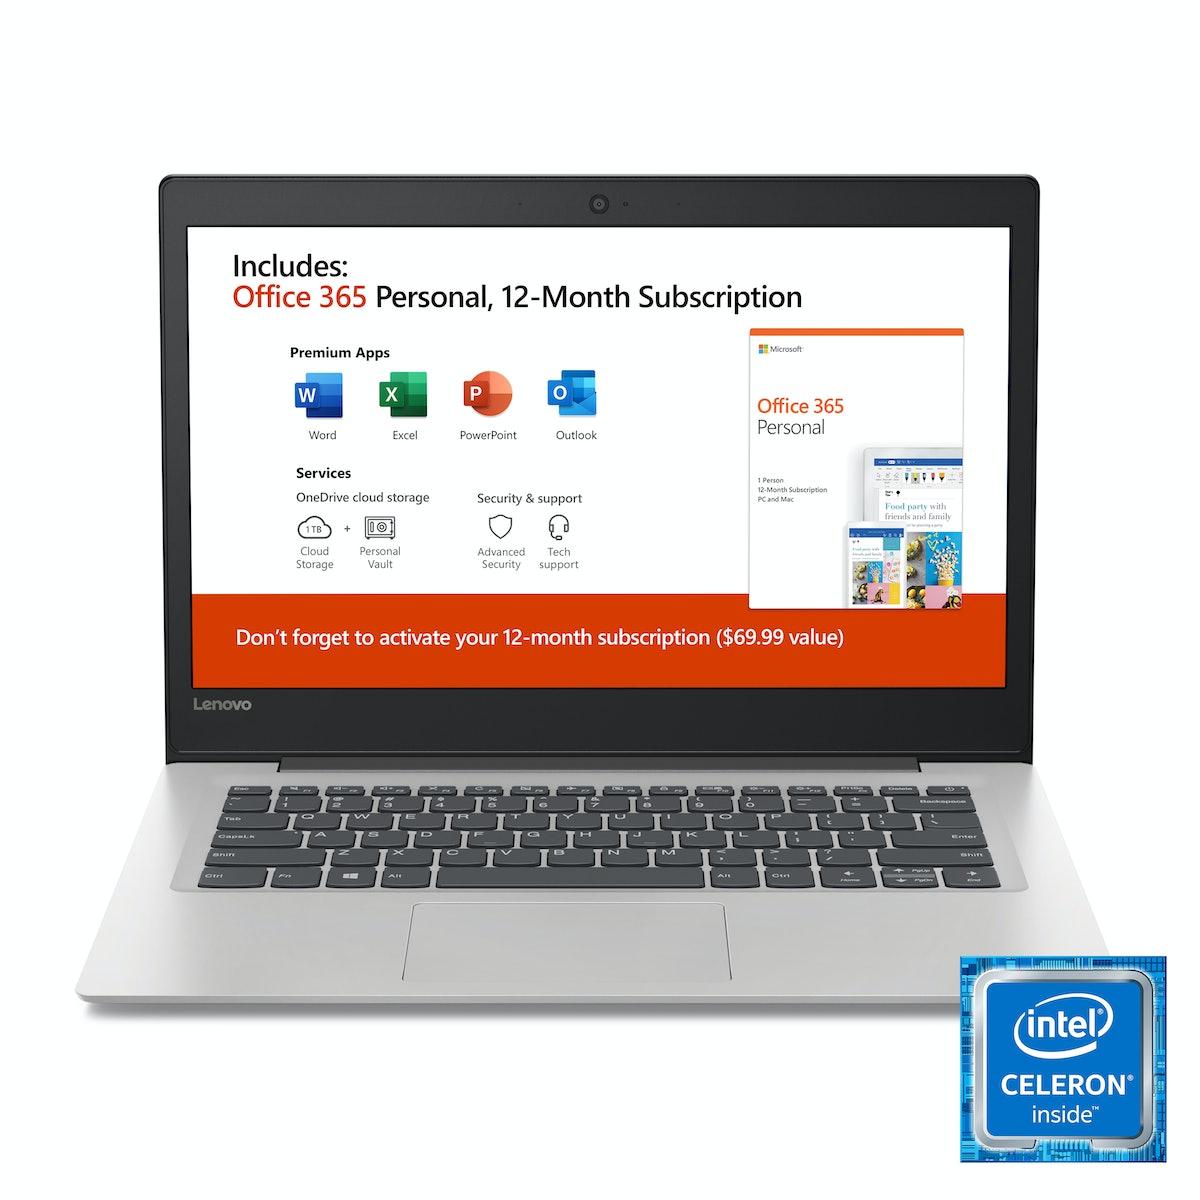 "Lenovo Ideapad 130s 14.0"" Laptop with Windows 10"